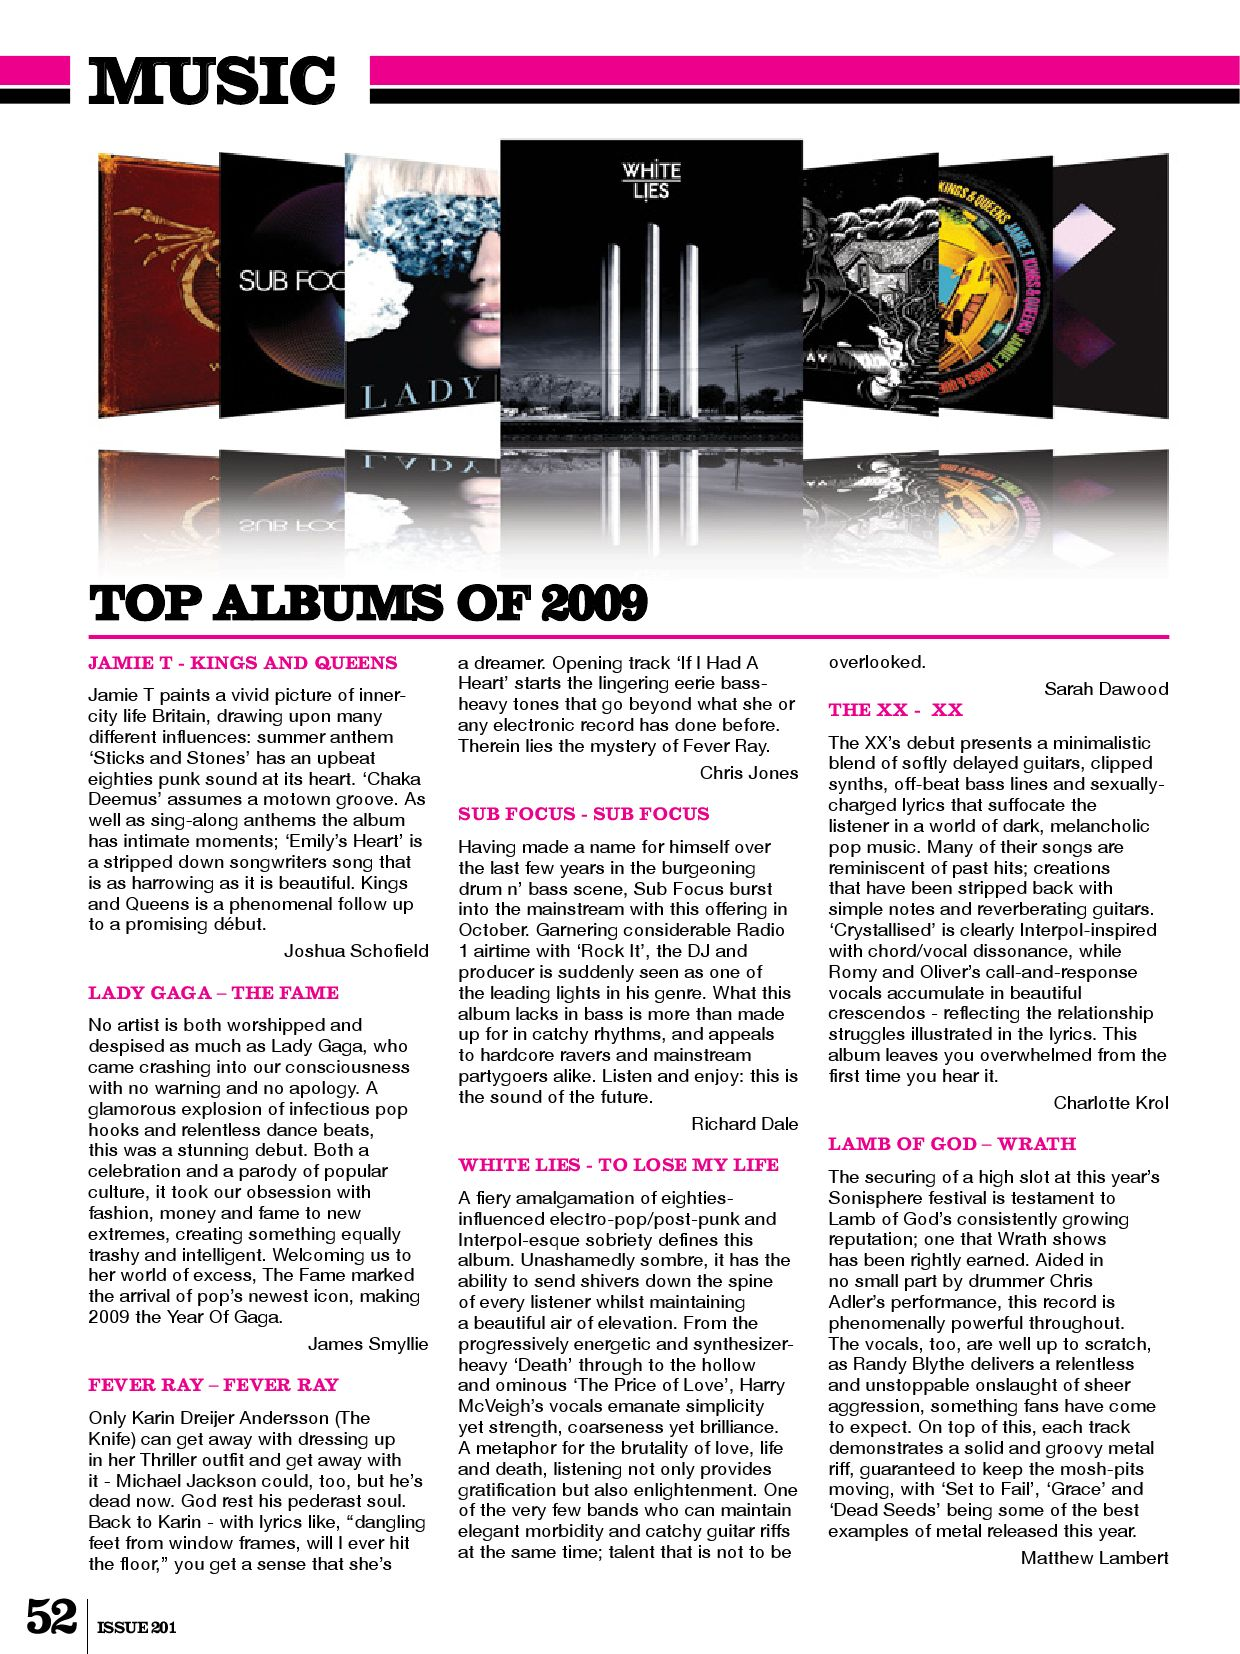 Impact Magazine - Issue 201 - Jan 2010 by Impact Magazine - issuu